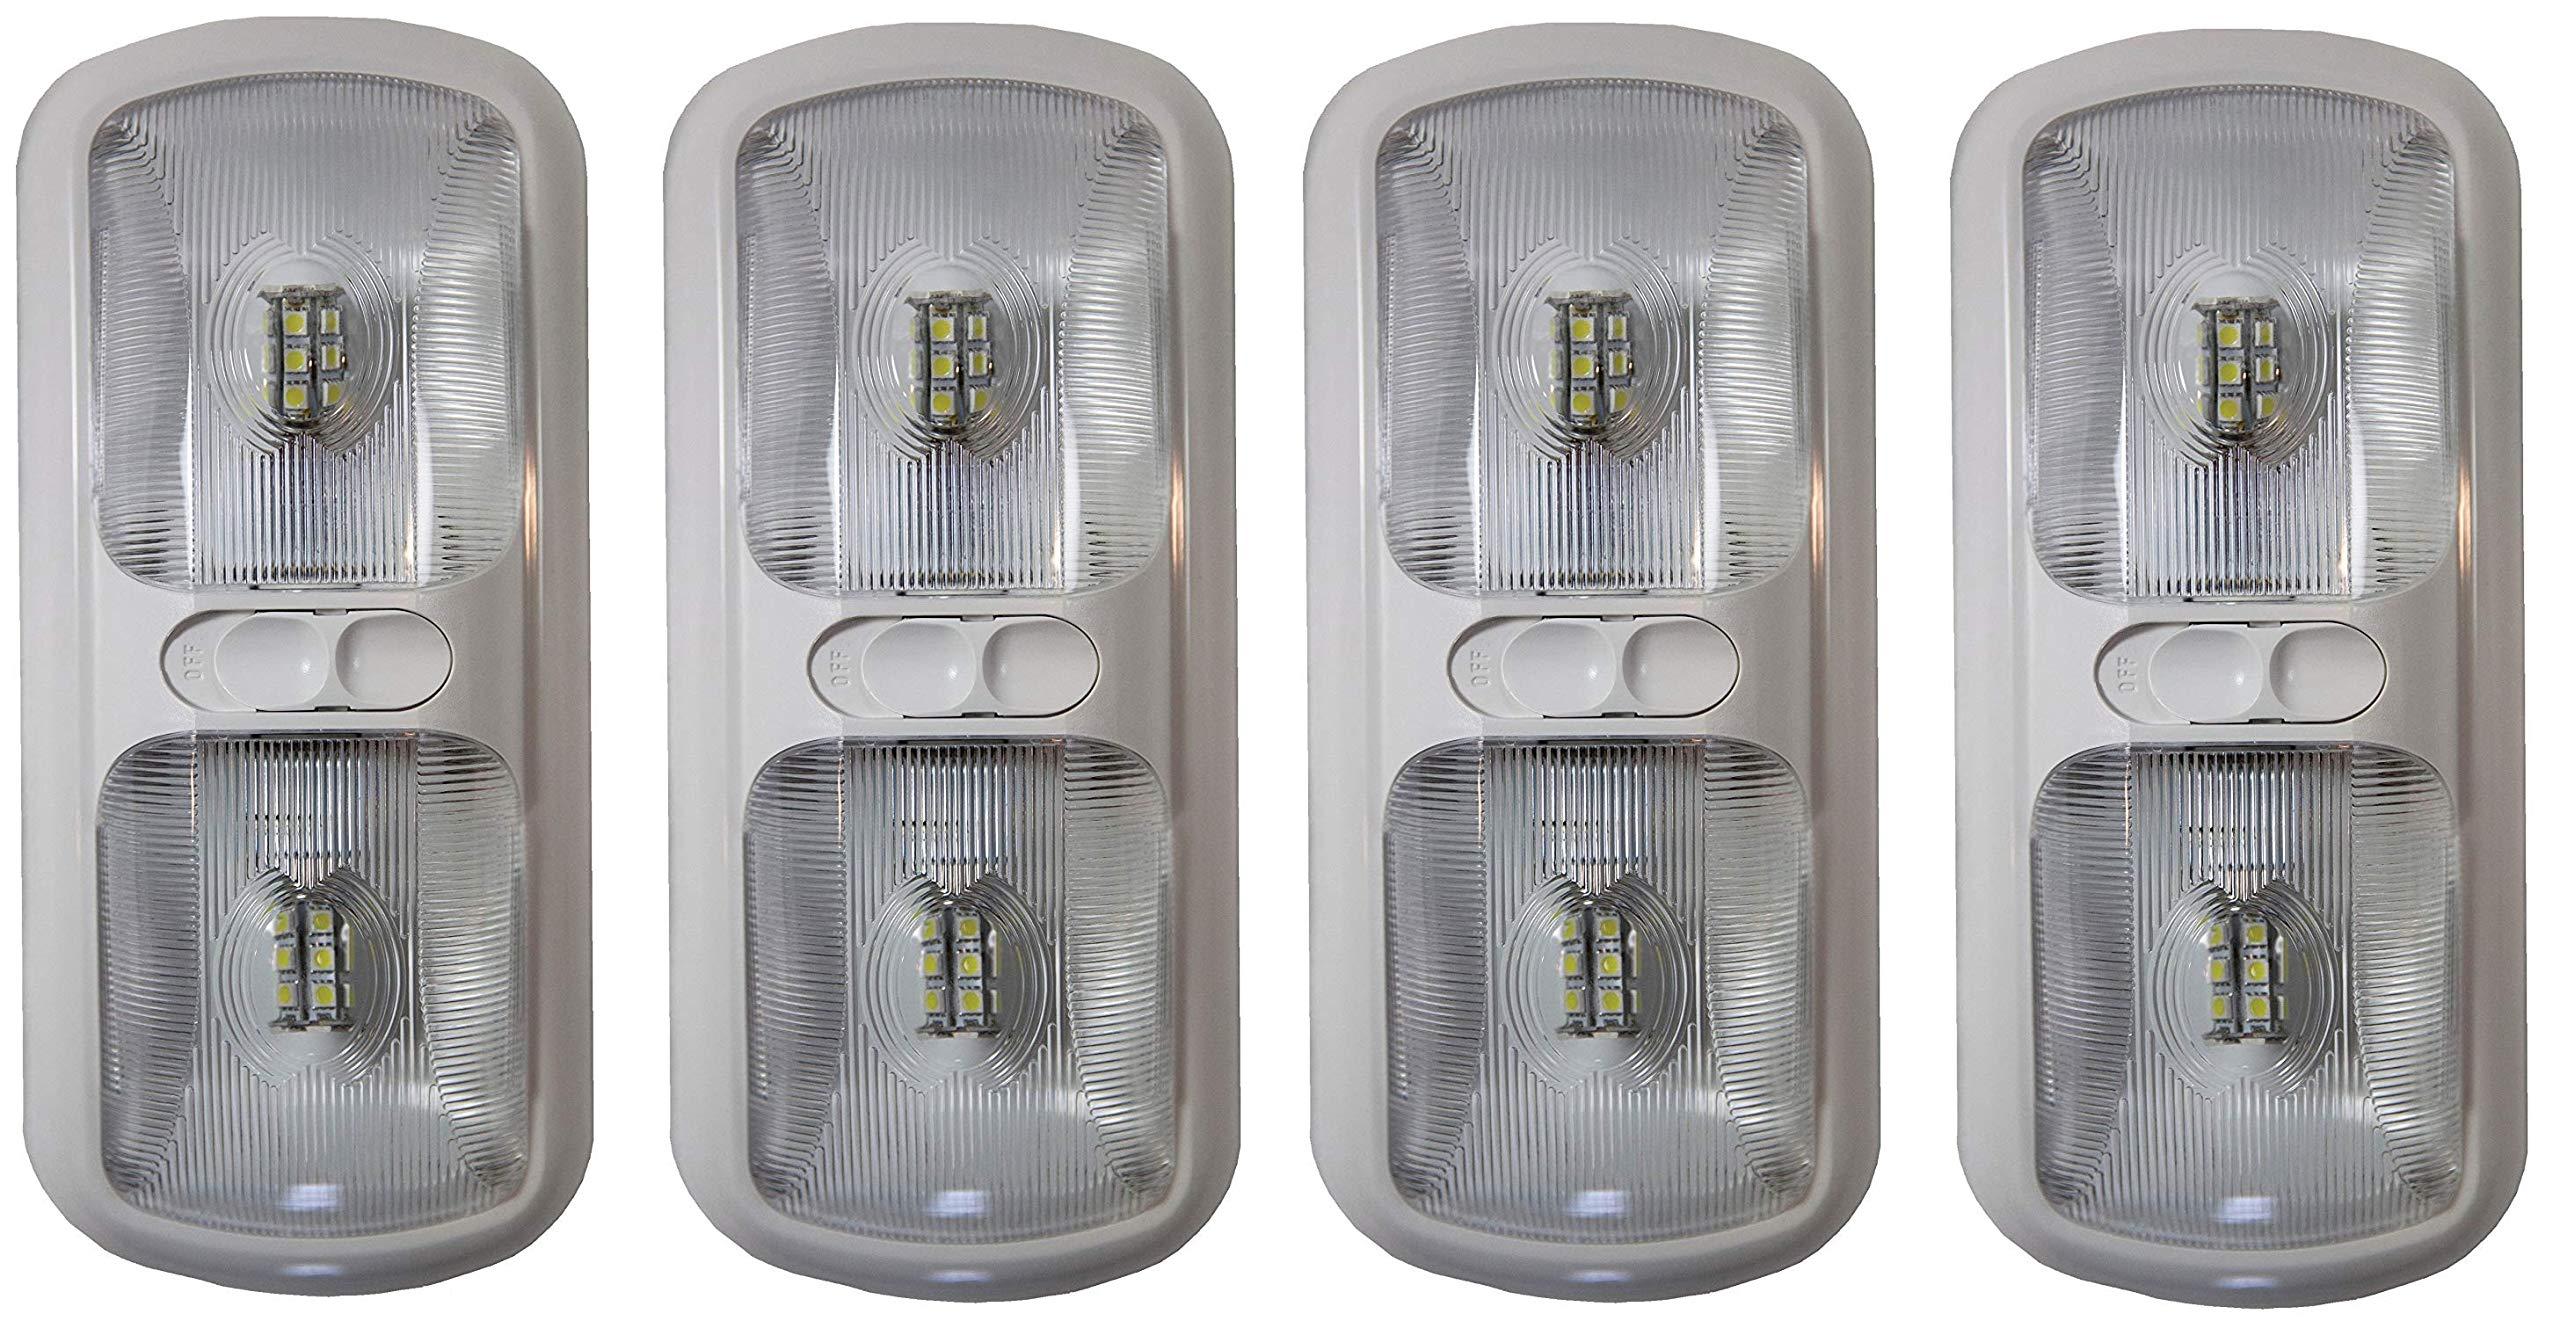 Arcon  20670 Bright White EU-Lite Double LED Light with Optic Lens (4)